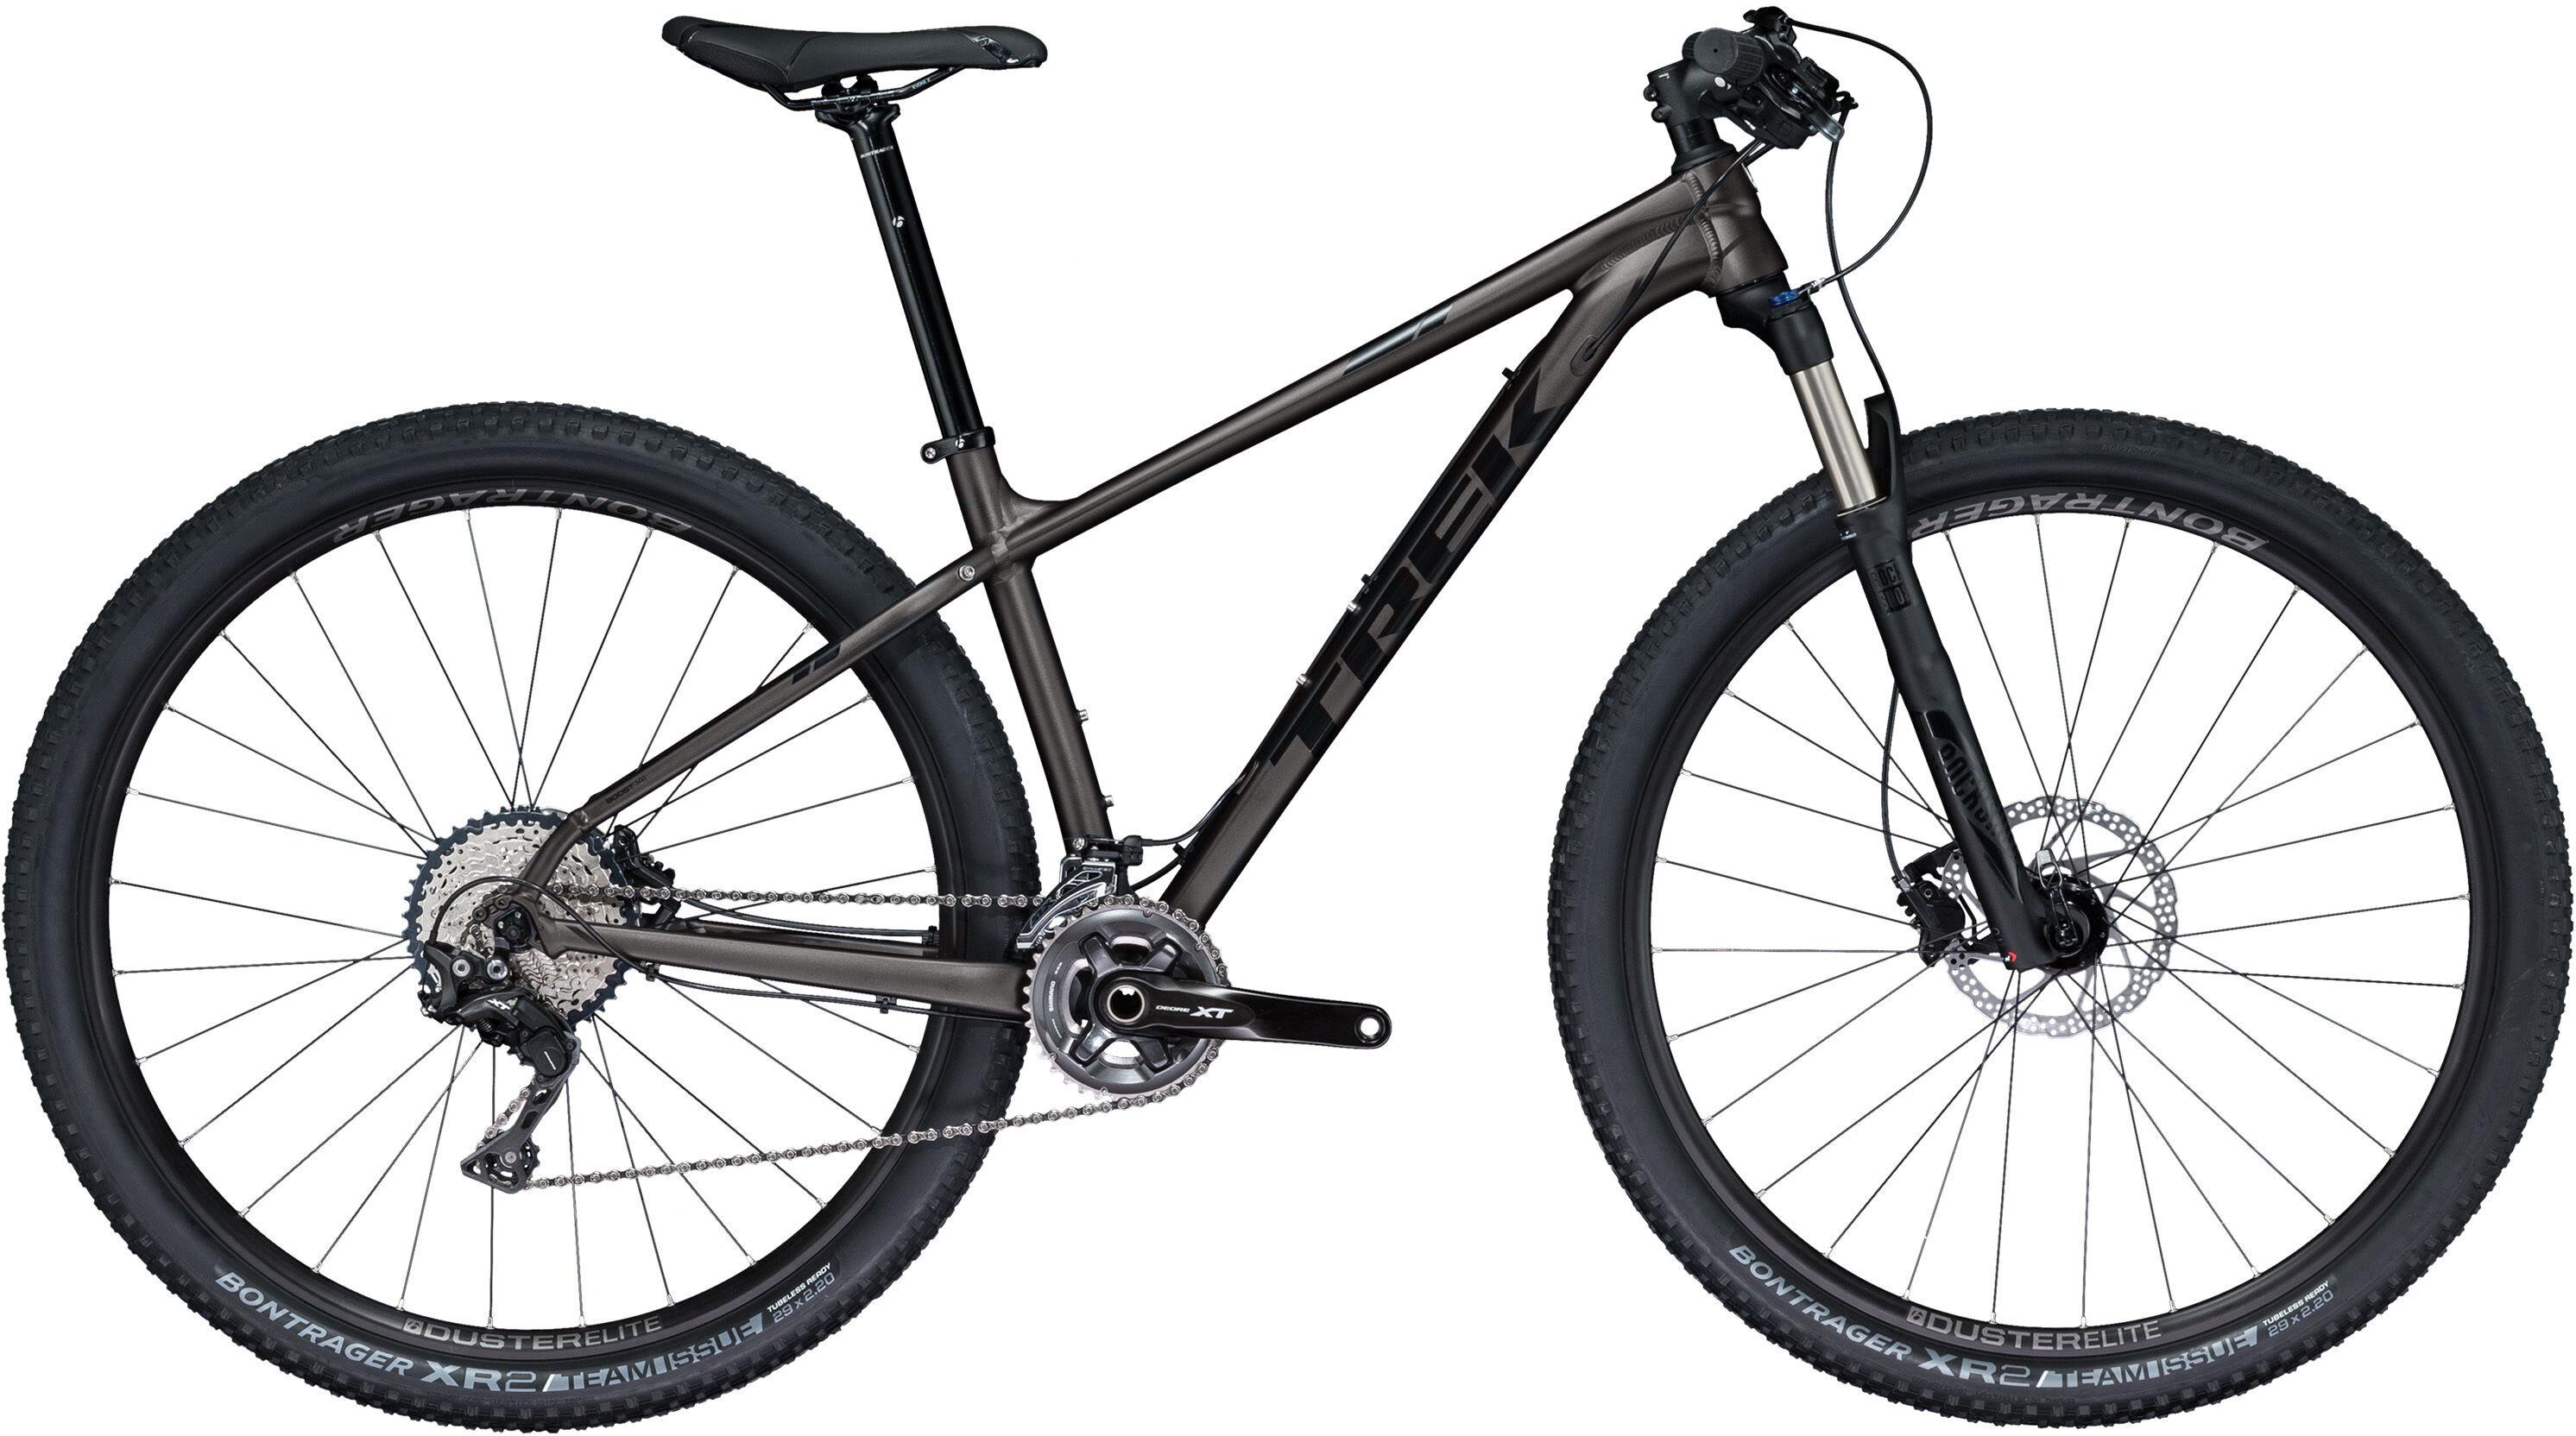 Trek X-Caliber 9 29 matte dnister black online kaufen | fahrrad.de